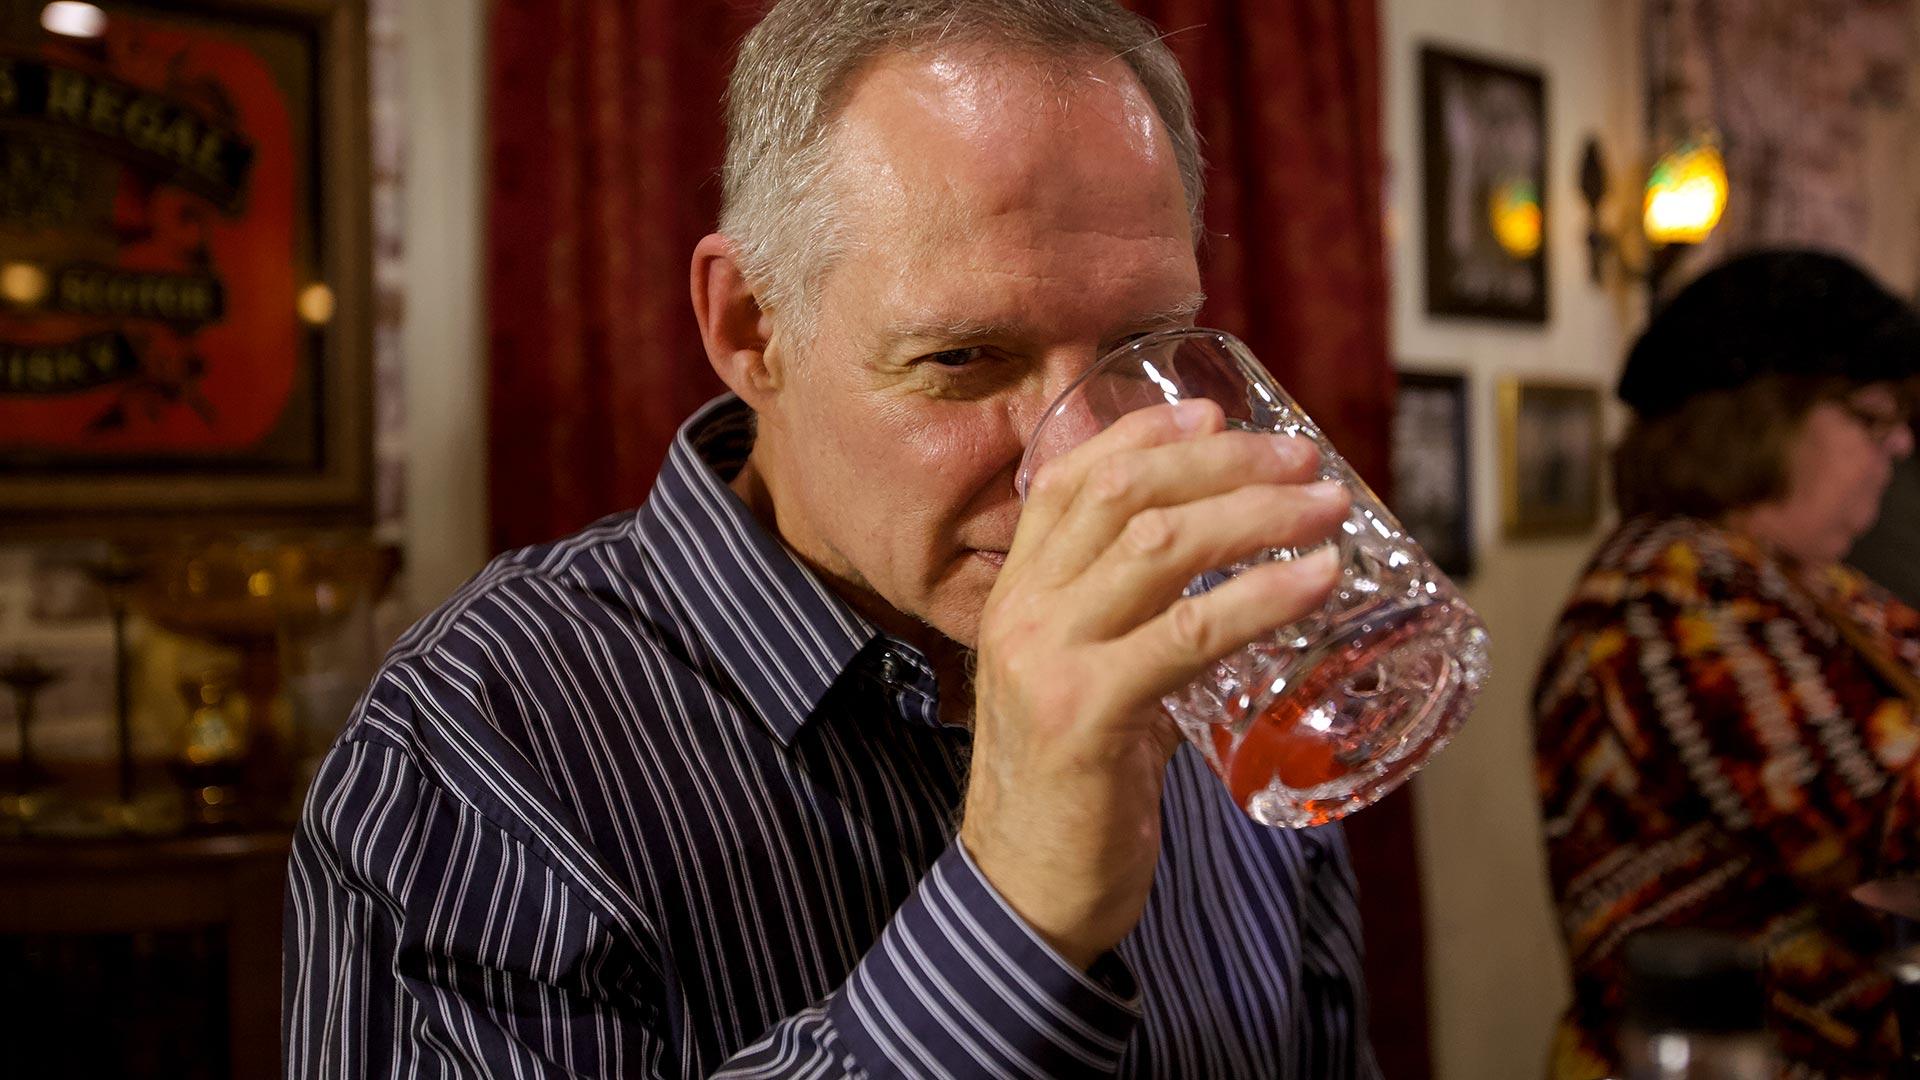 Customer tasting whiskey at Savannah Speakeasy whiskey Class